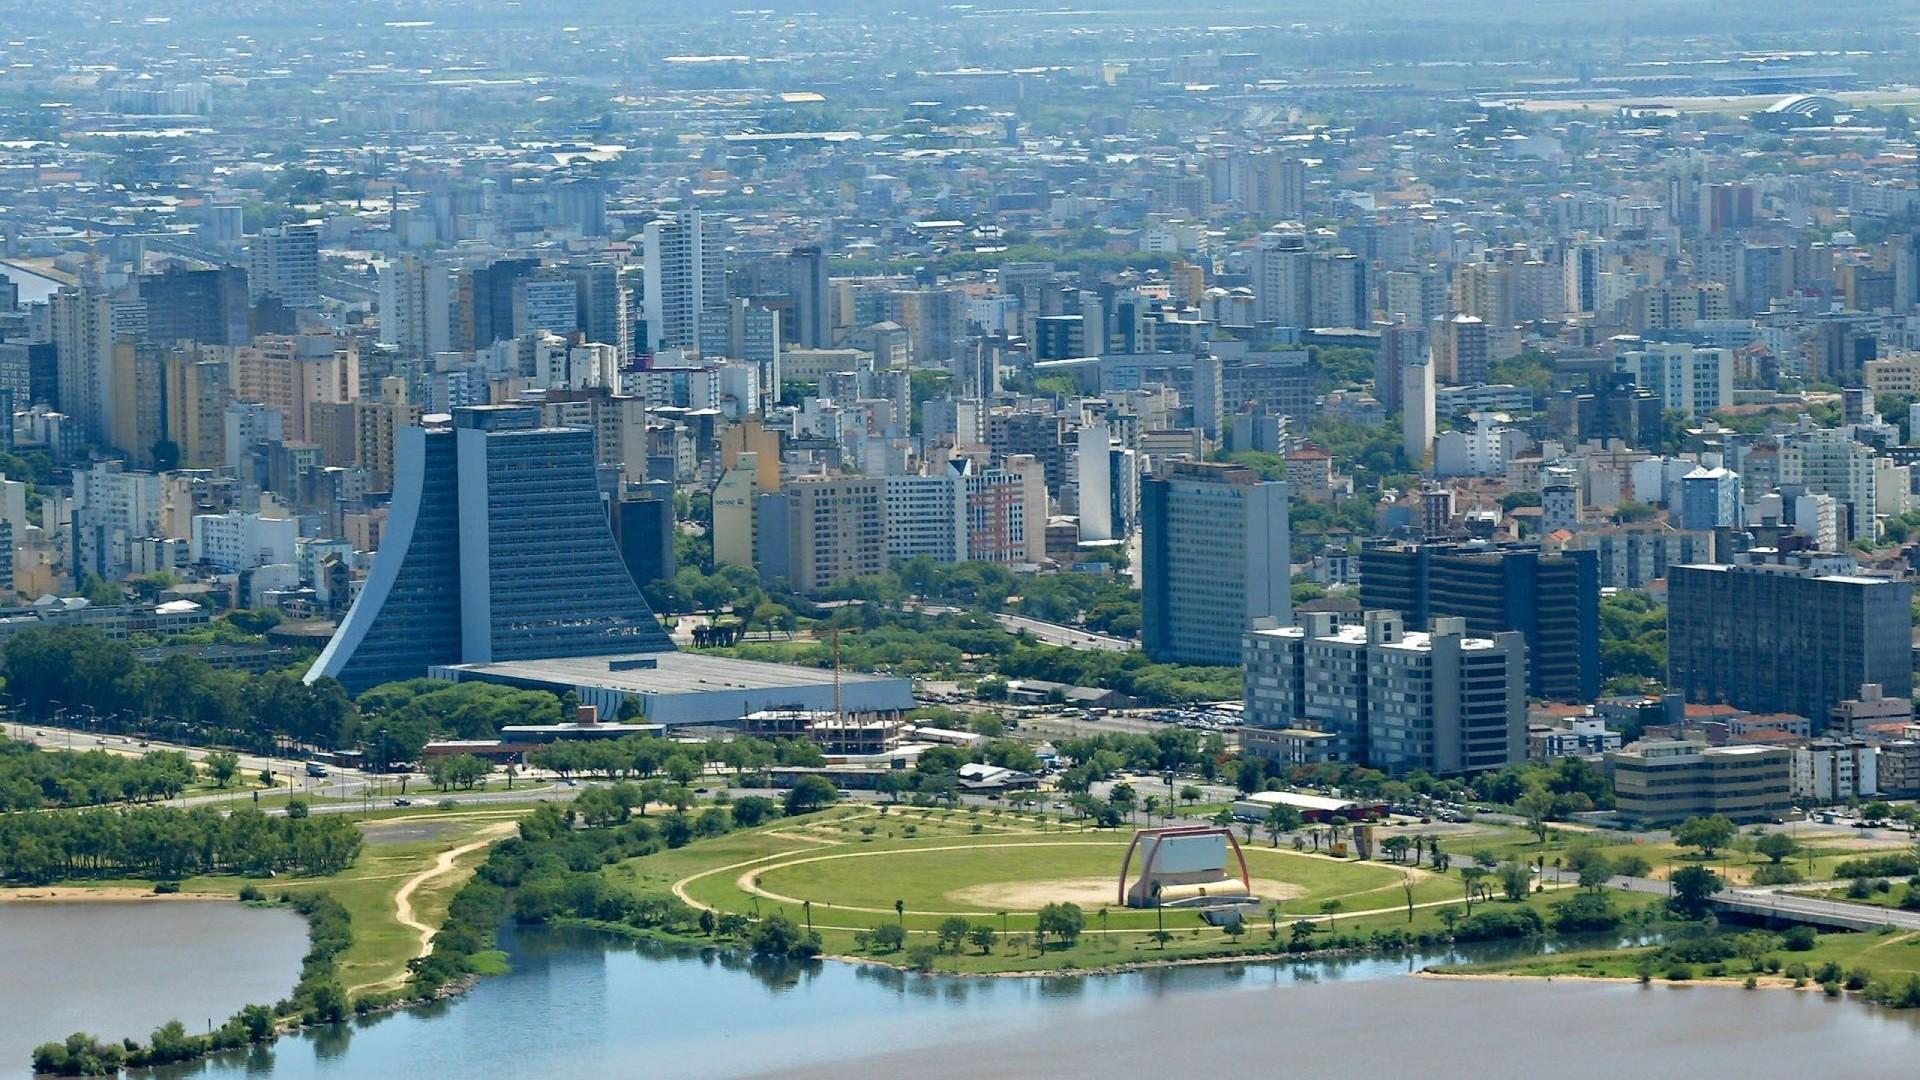 Experiencia en Porto Alegre, Brasil por Marcelo | Experiencia Erasmus Porto  Alegre